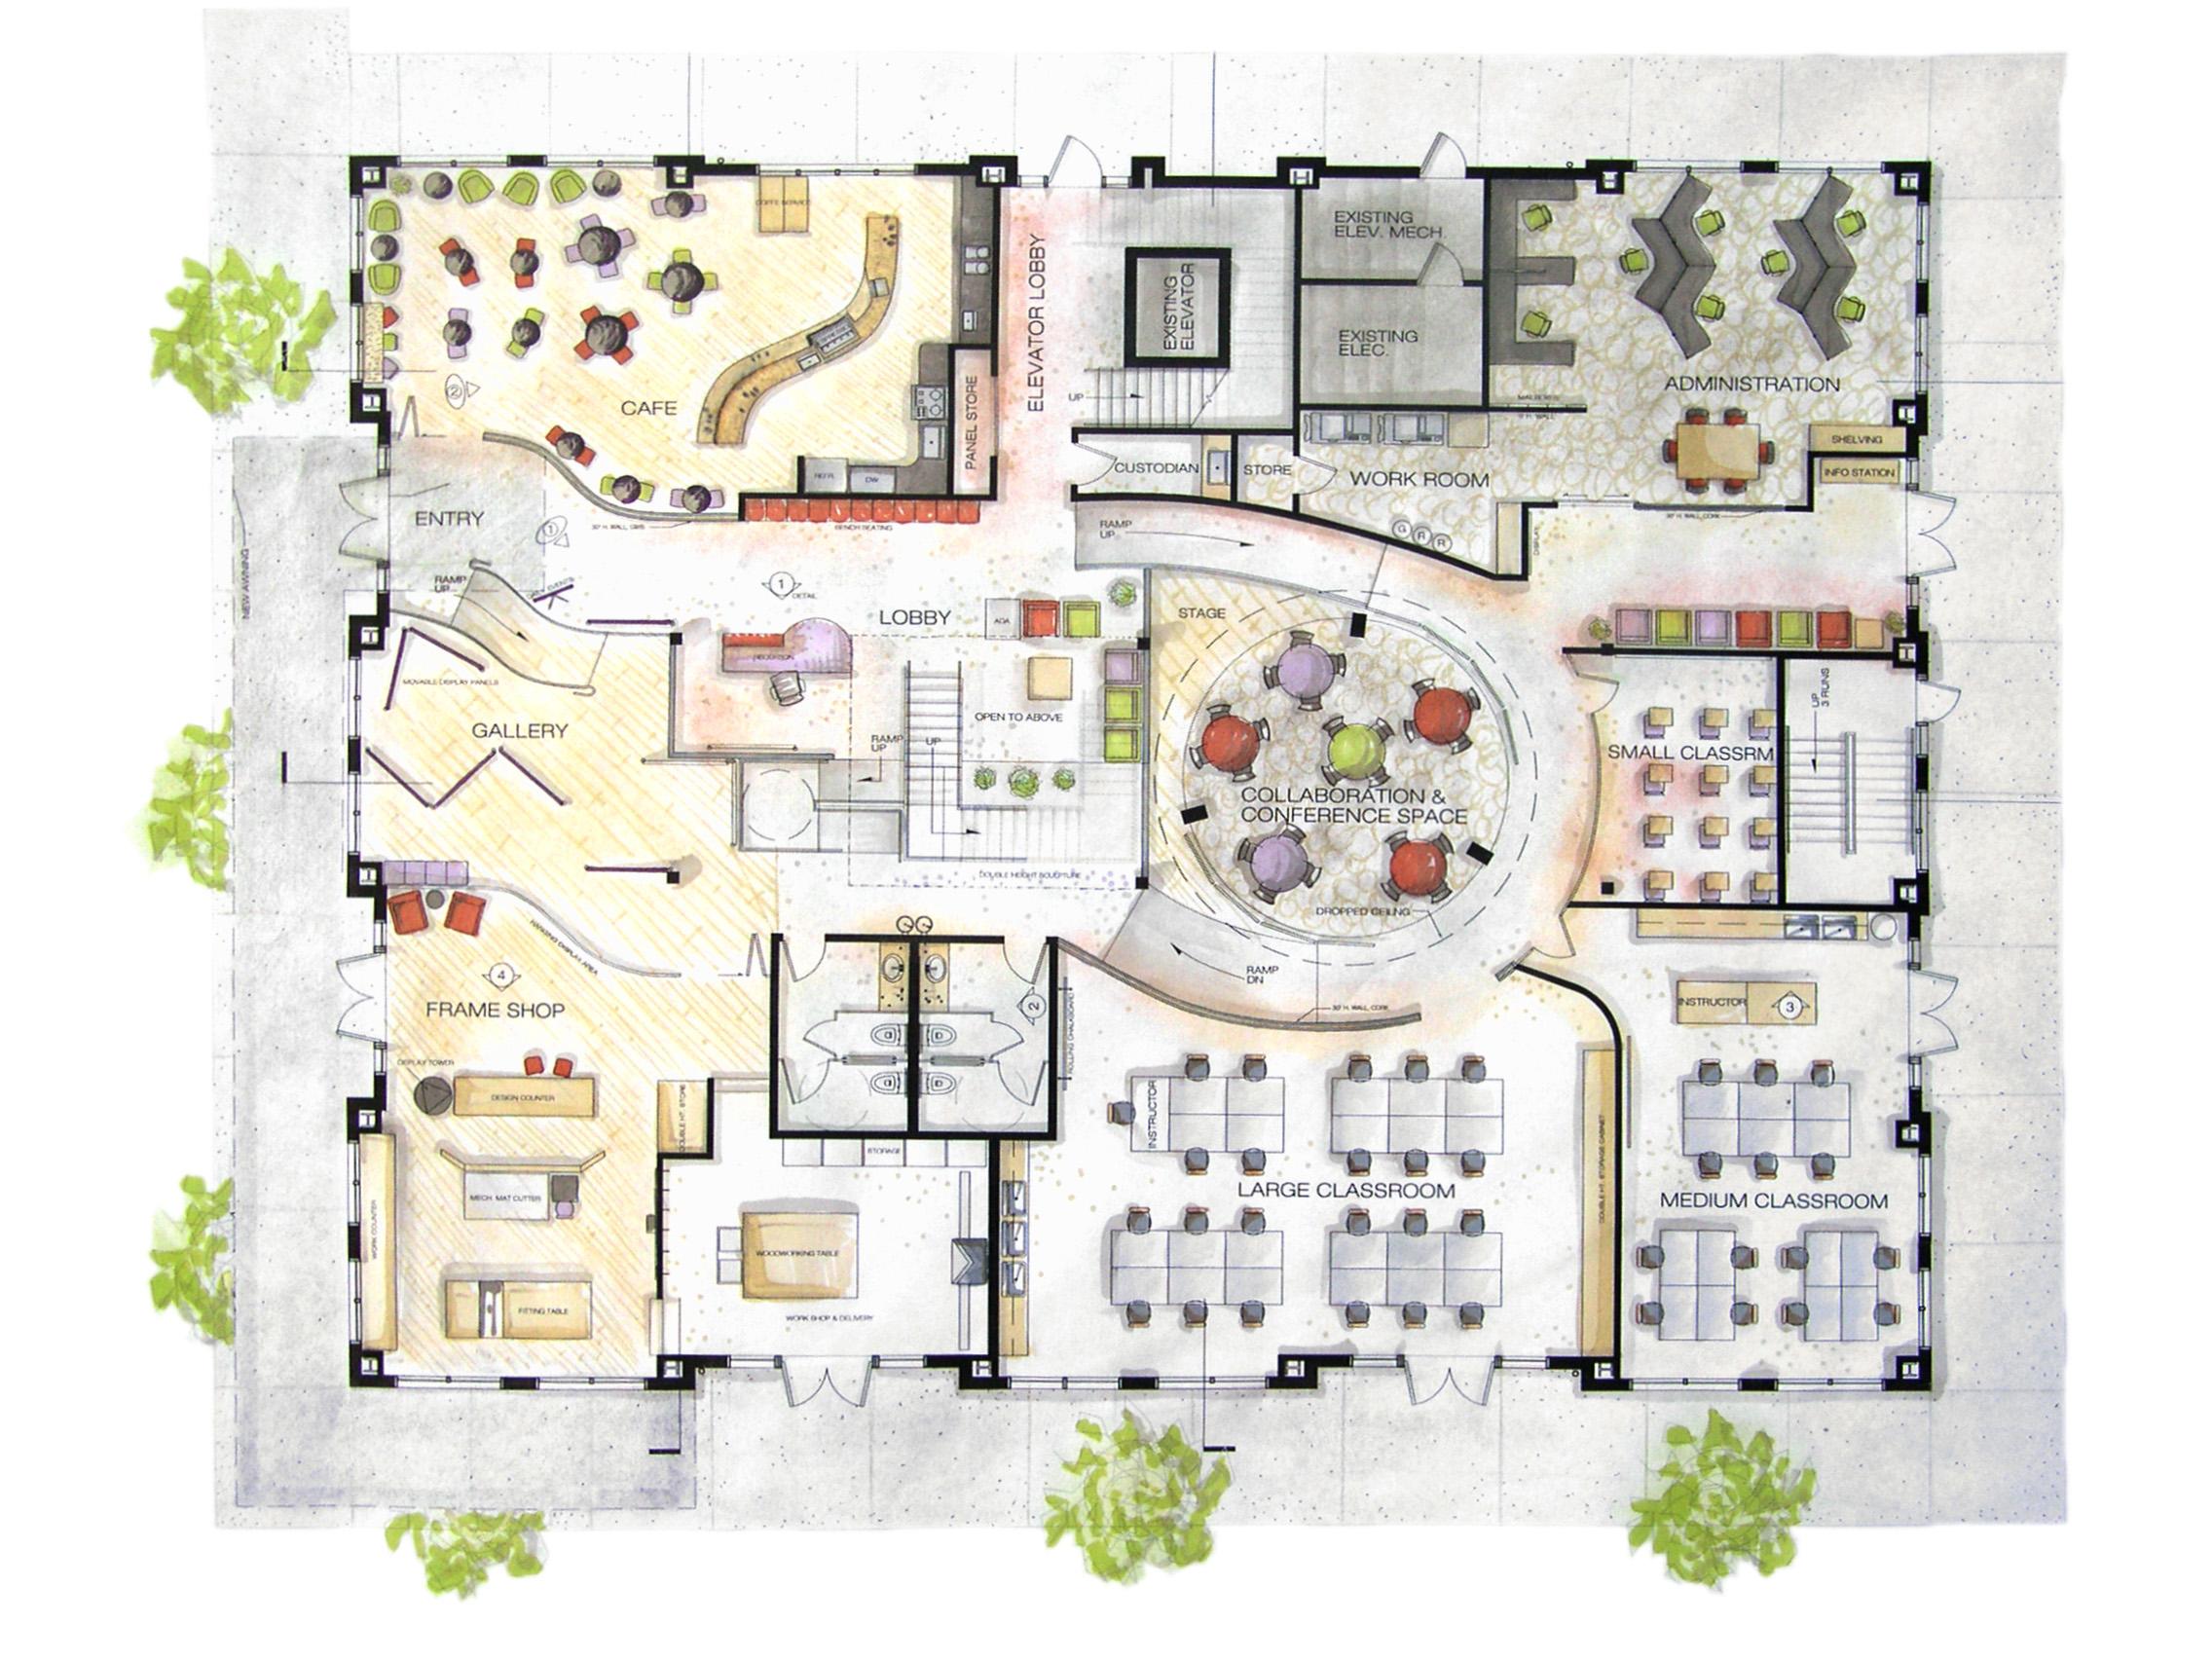 Kitchen Design Ideas For Community Center ~ Community center design by meredith goin at coroflot